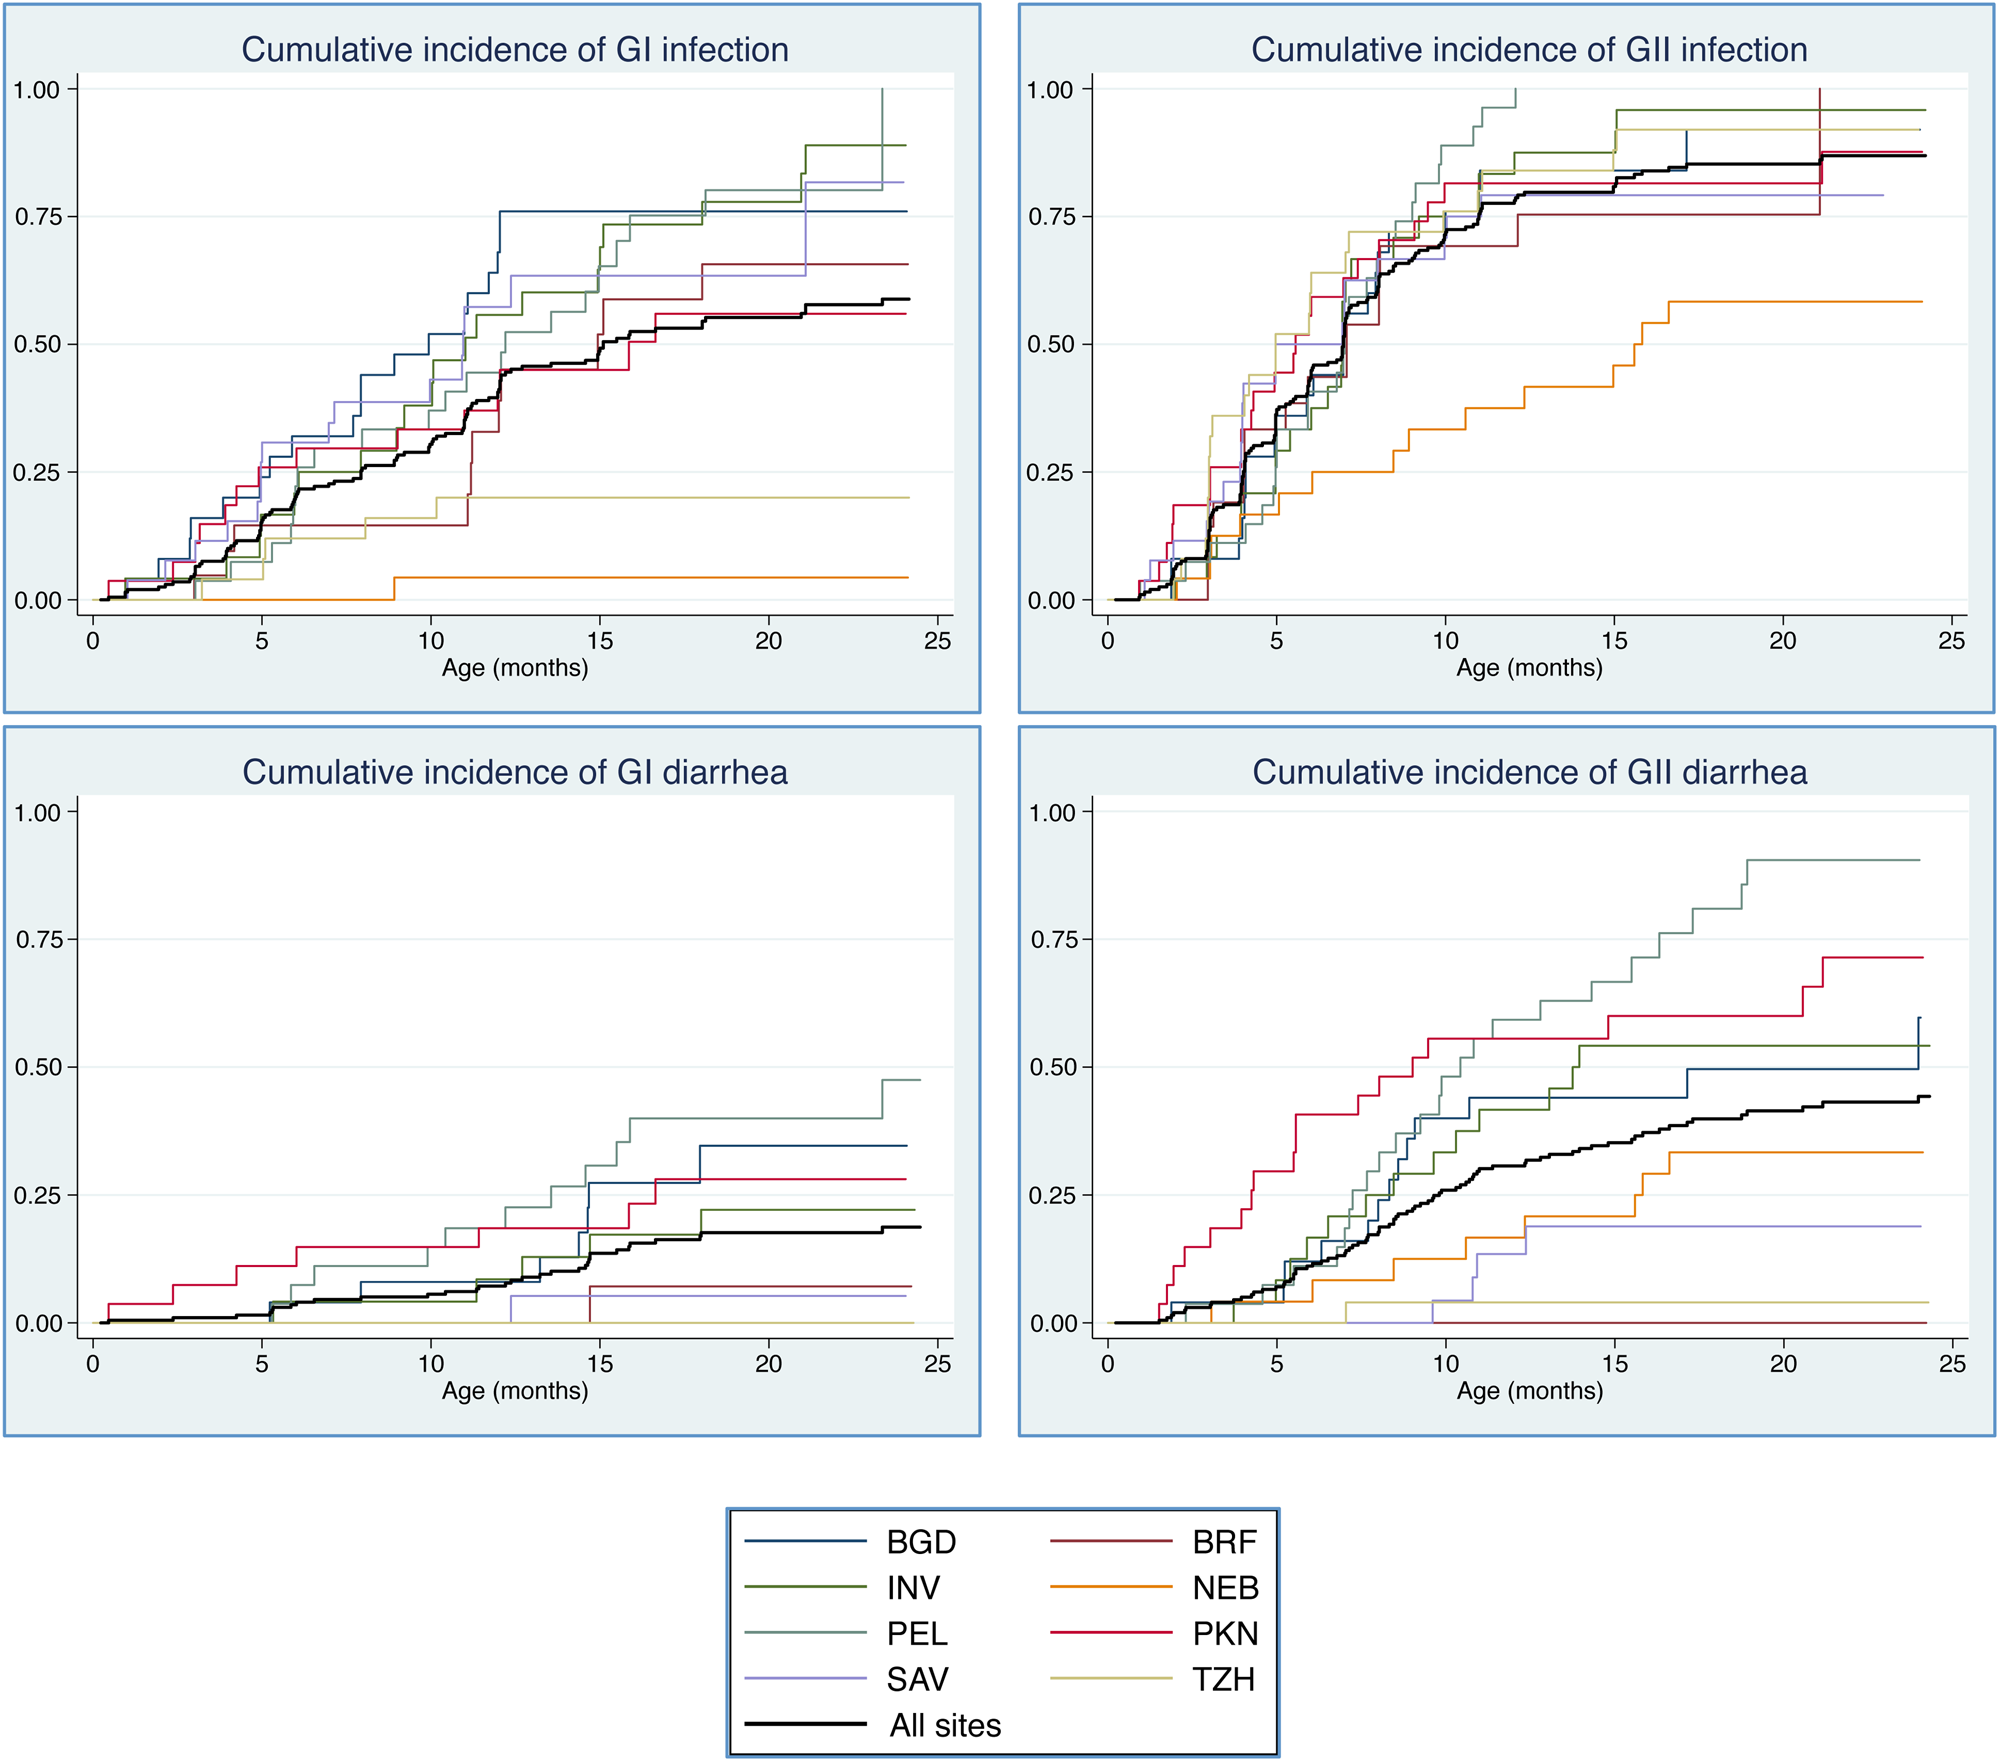 Cumulative incidence of norovirus infection, by genogroup (GI and GII) and country: Abbreviations: BGD, Bangladesh; BRF, Brazil; INV, India; NEB, Nepal; PEL, Peru; PKN, Pakistan; SAV, South Africa; TZH, Tanzania.